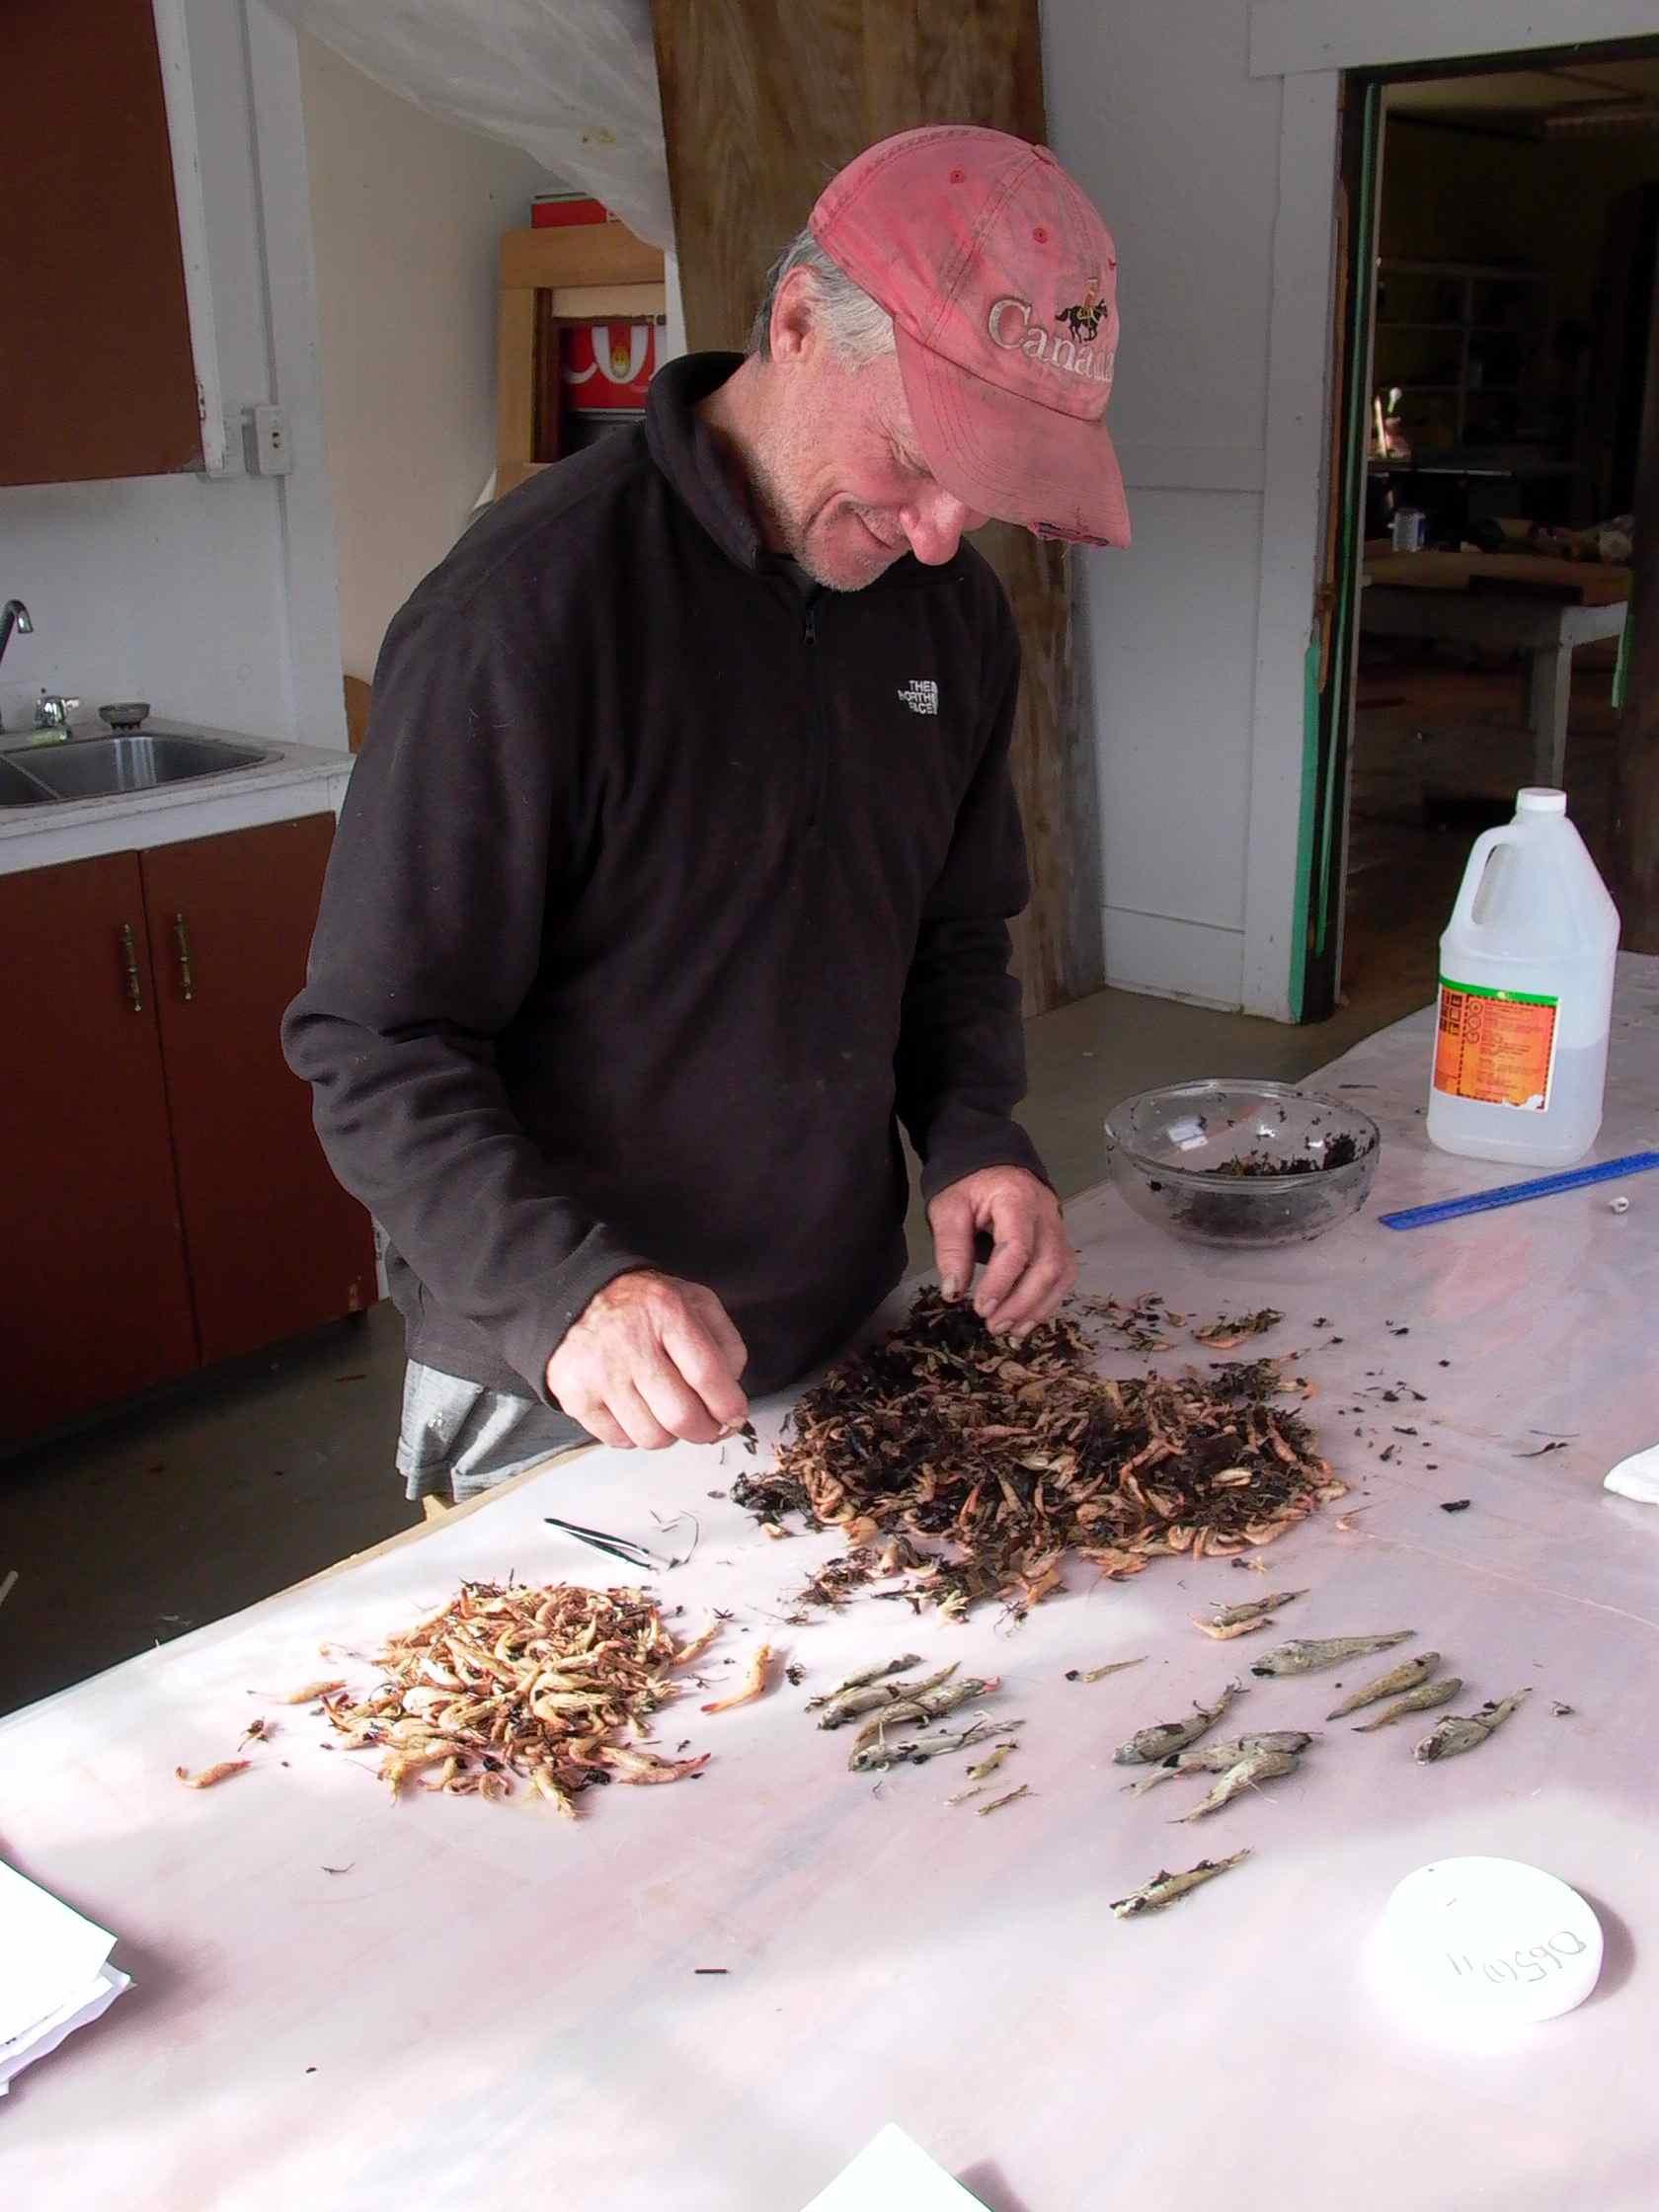 Cassiar Cannery - SERC - MB - JK - 2011/2012 - JK, biologist